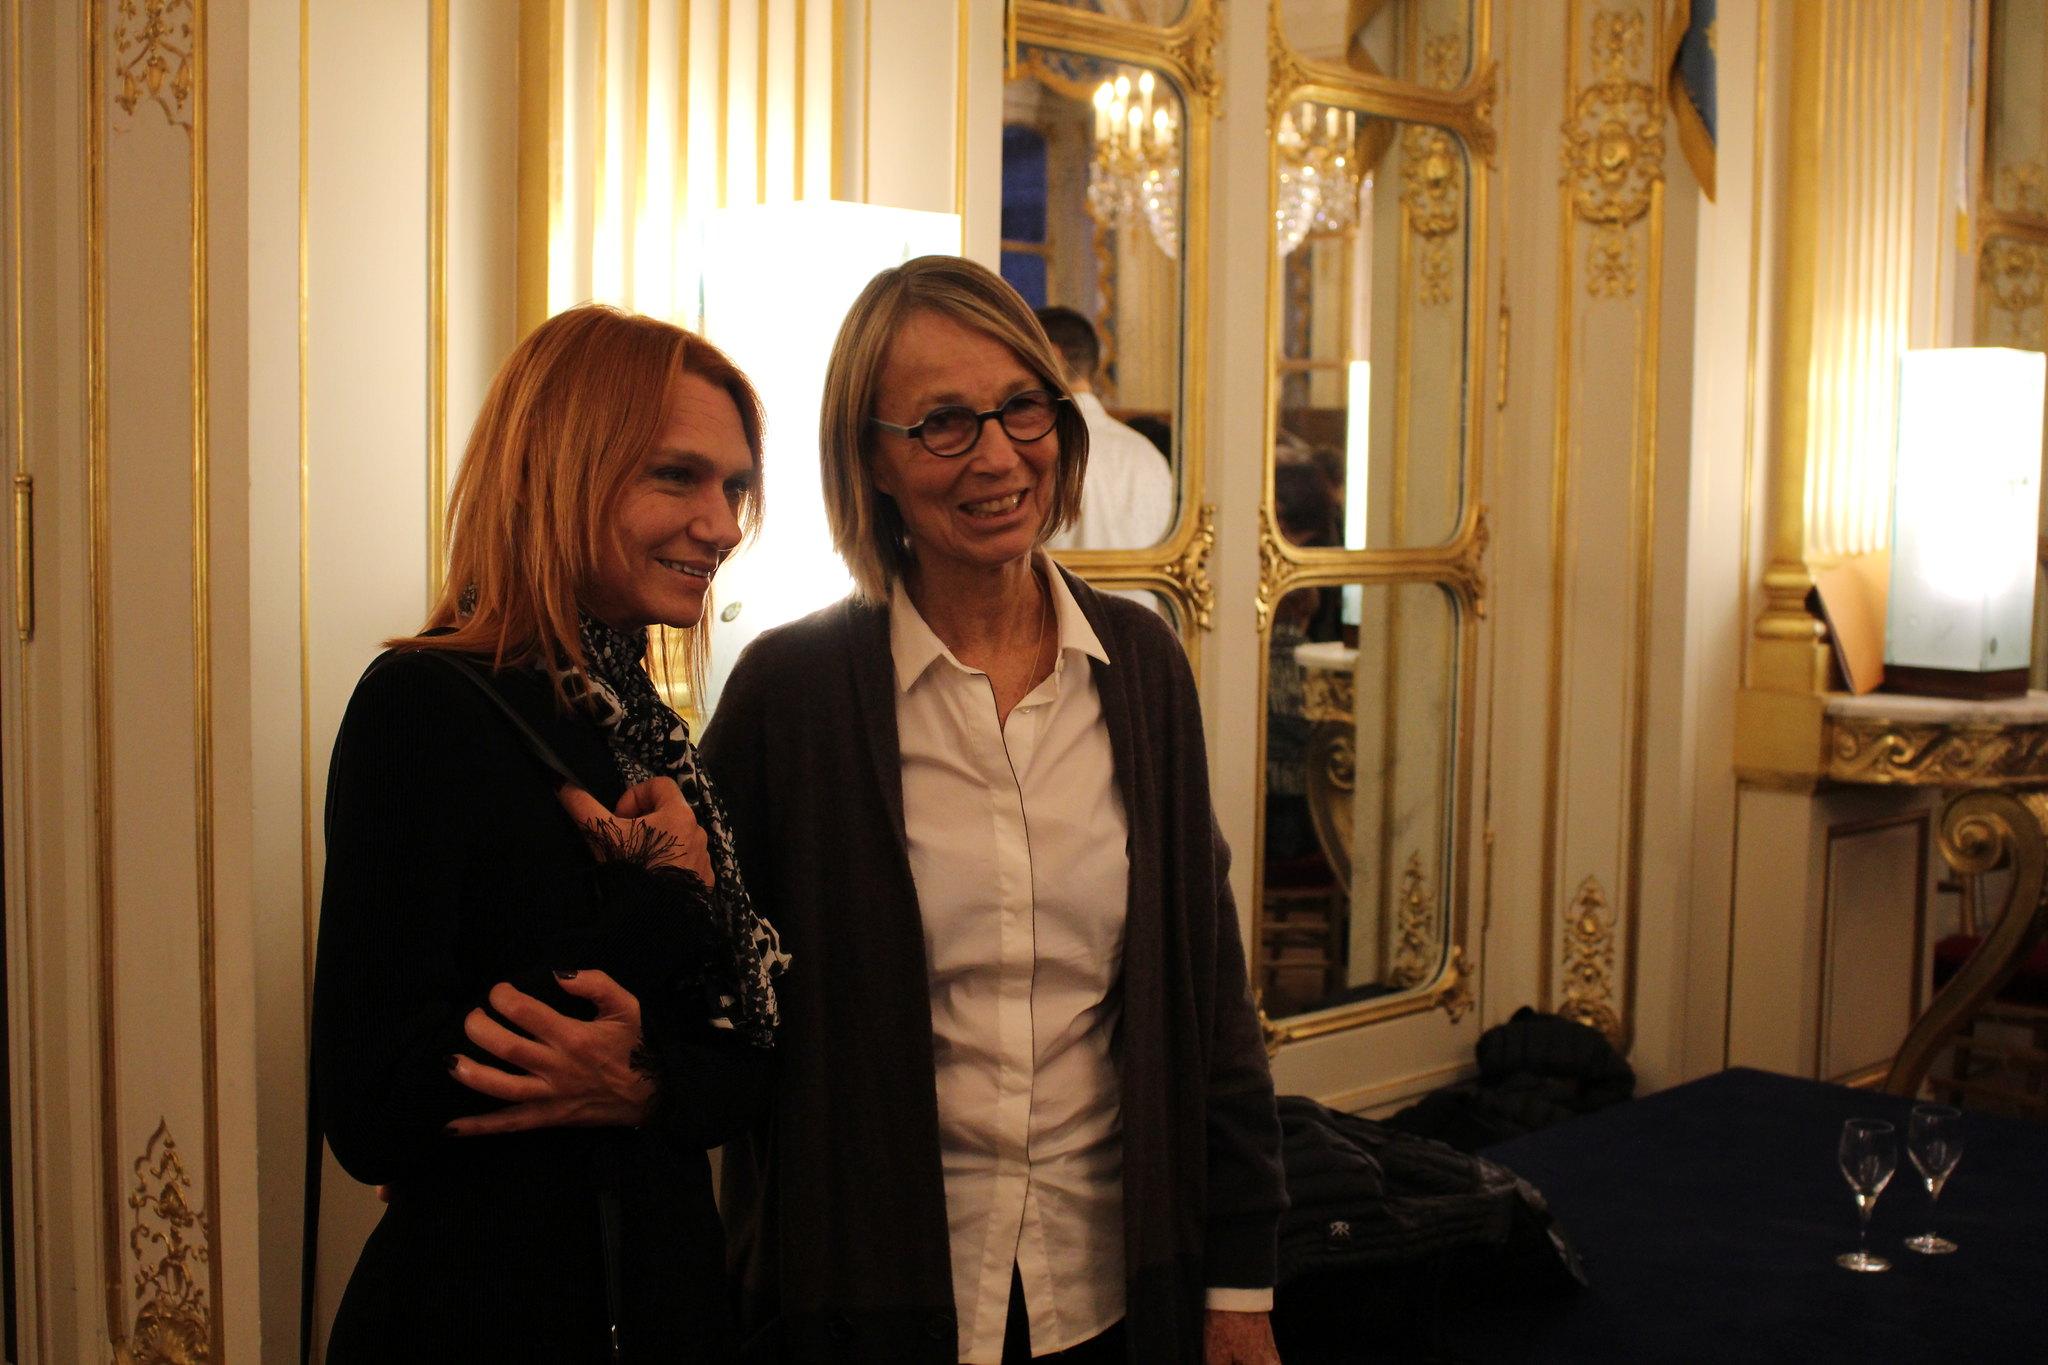 Françoise Nyssen et Asli Erdogan - La France à Francfort